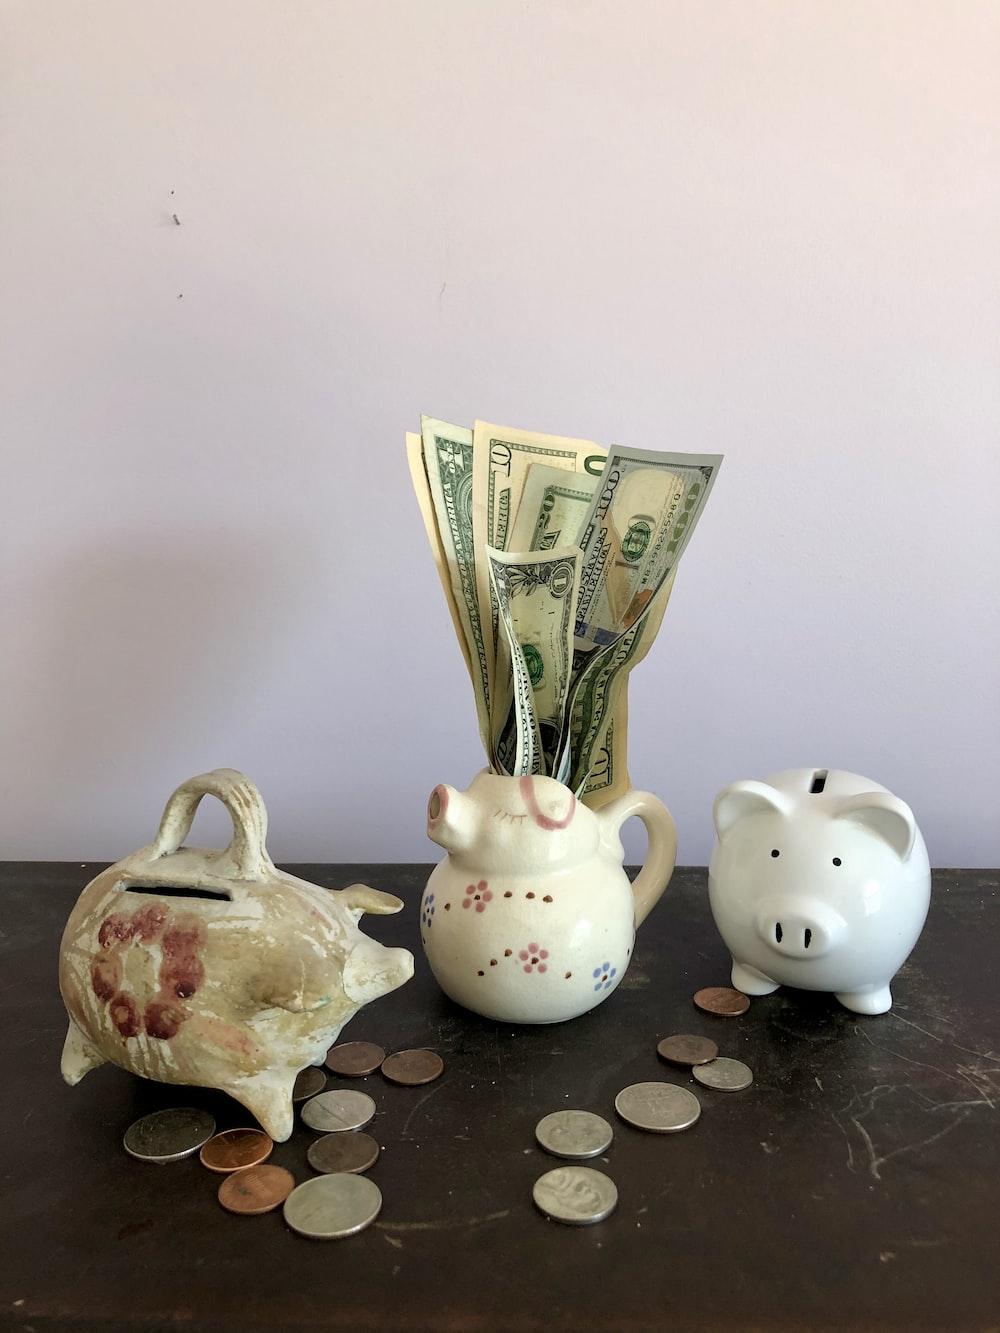 white ceramic teapot beside white ceramic teapot